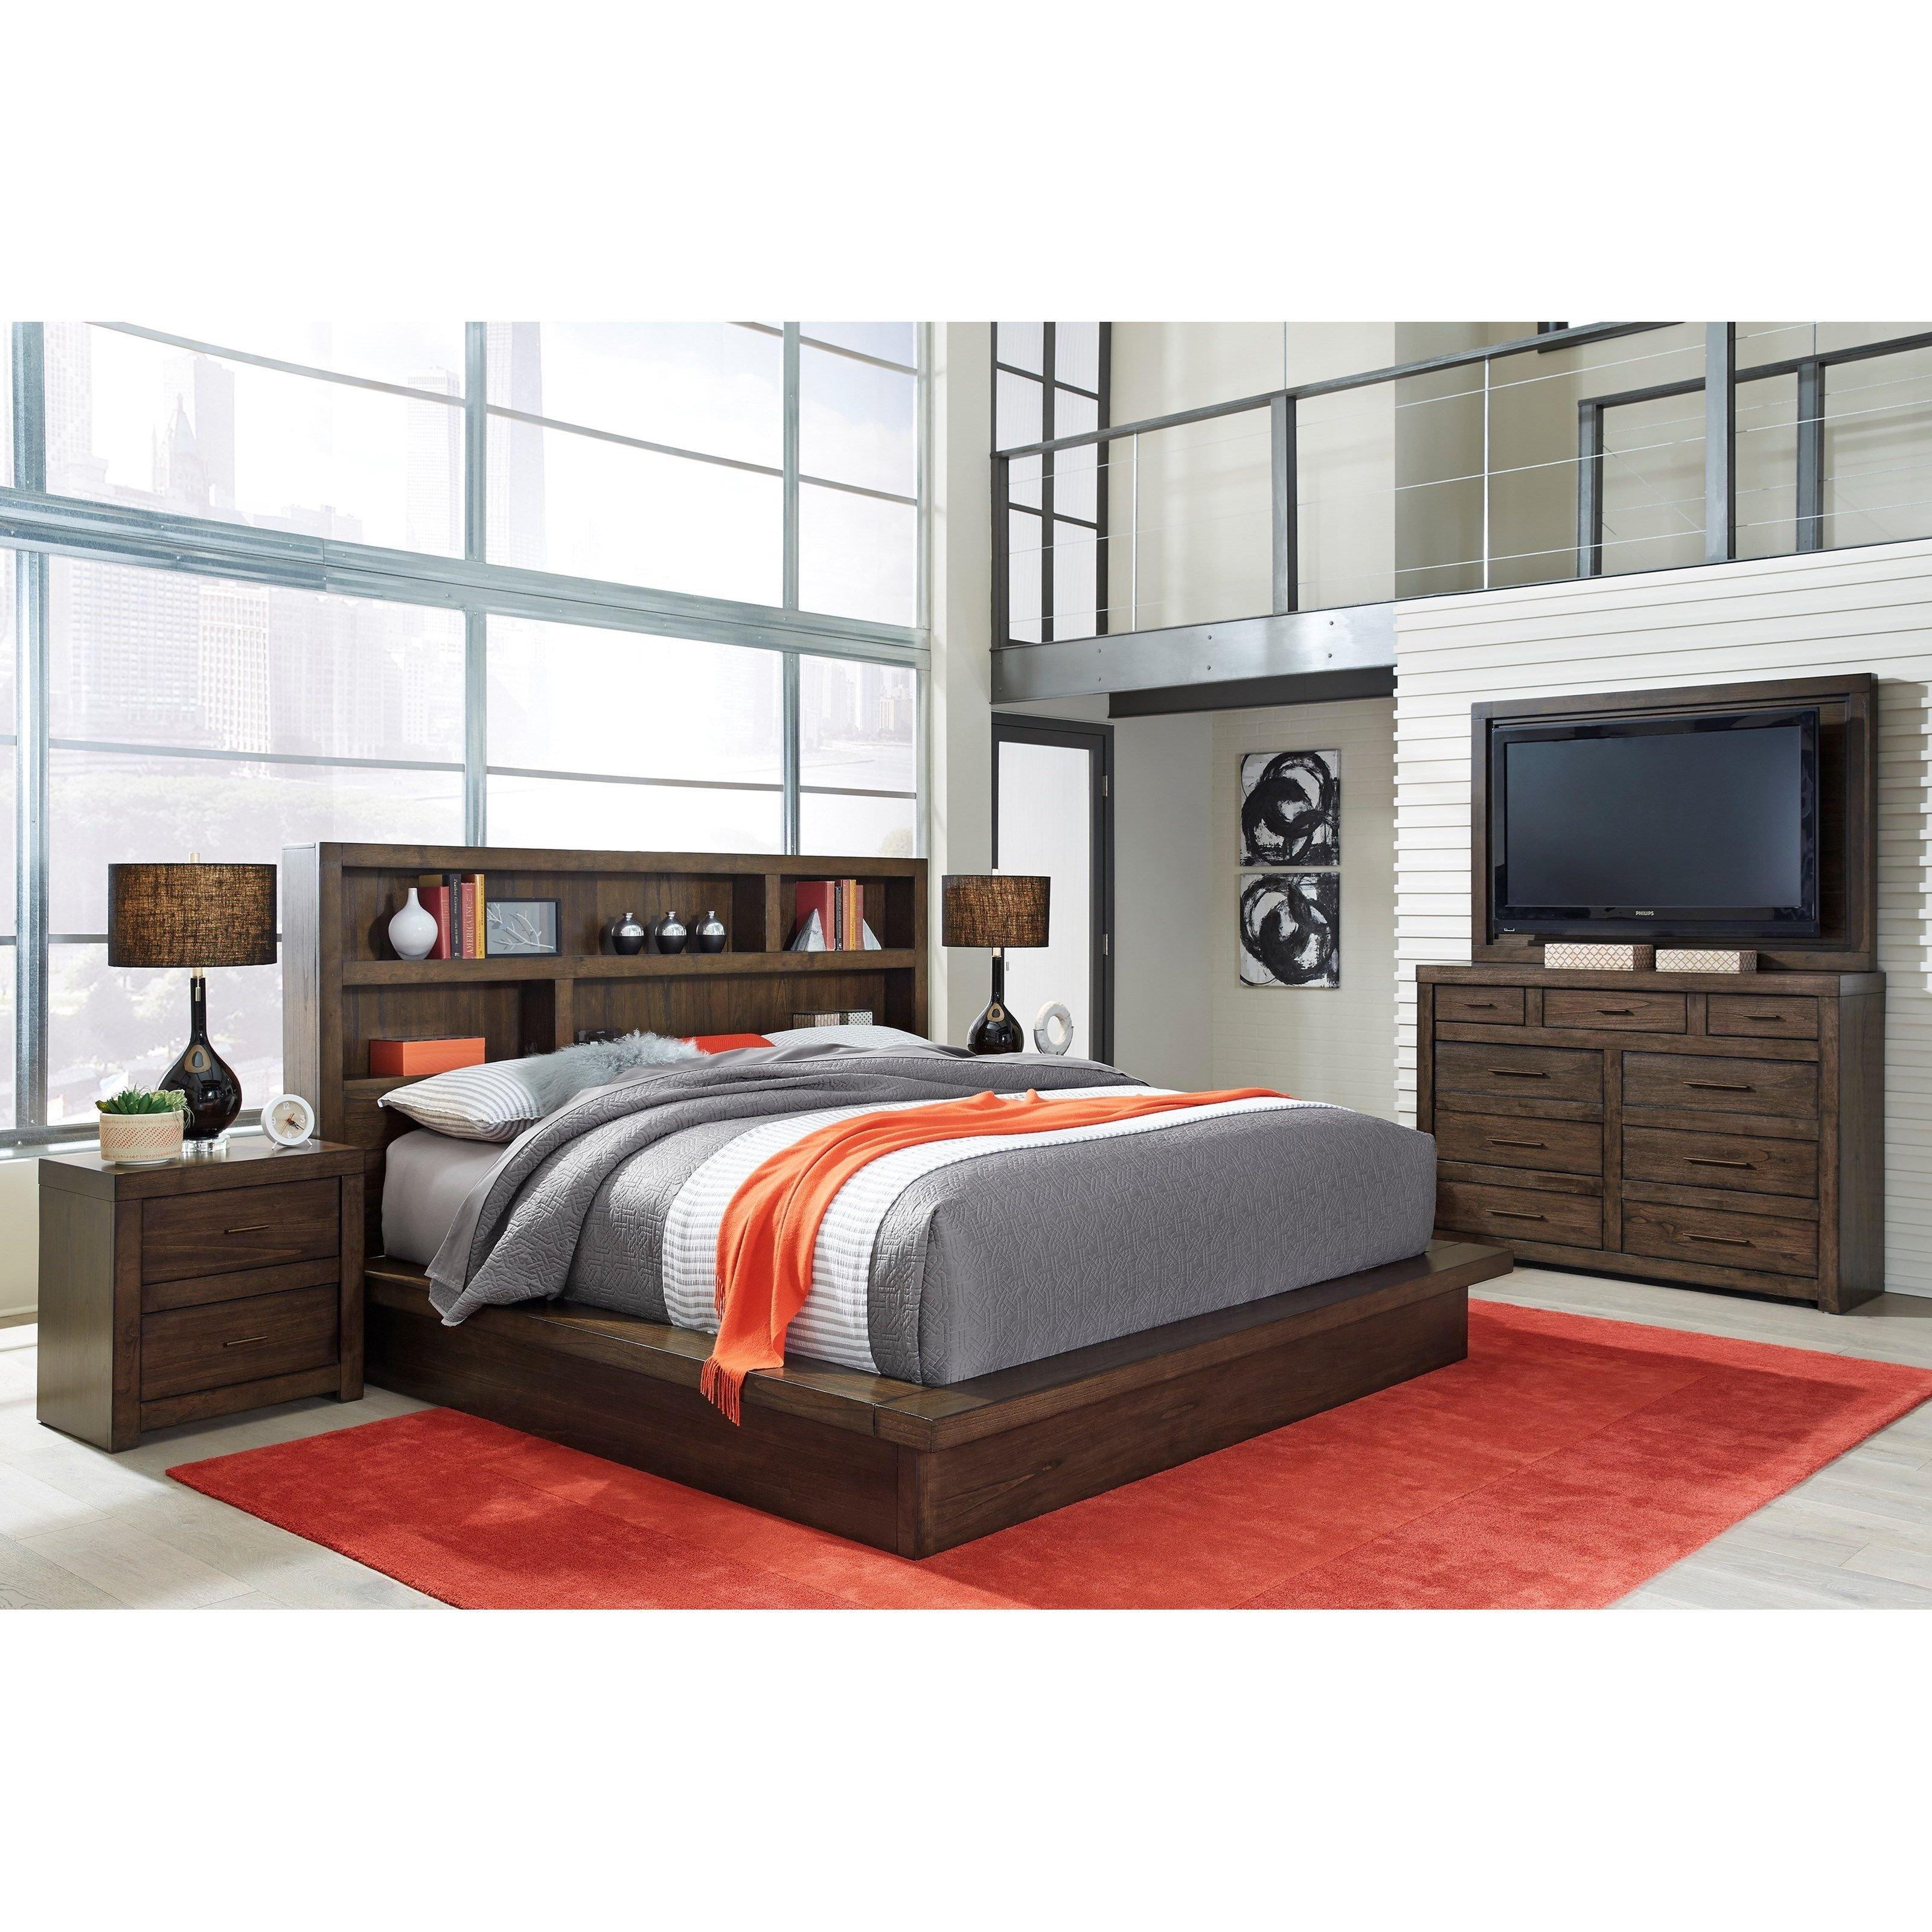 Bedroom Set California King New Modern Loft California King Bedroom Group by aspenhome